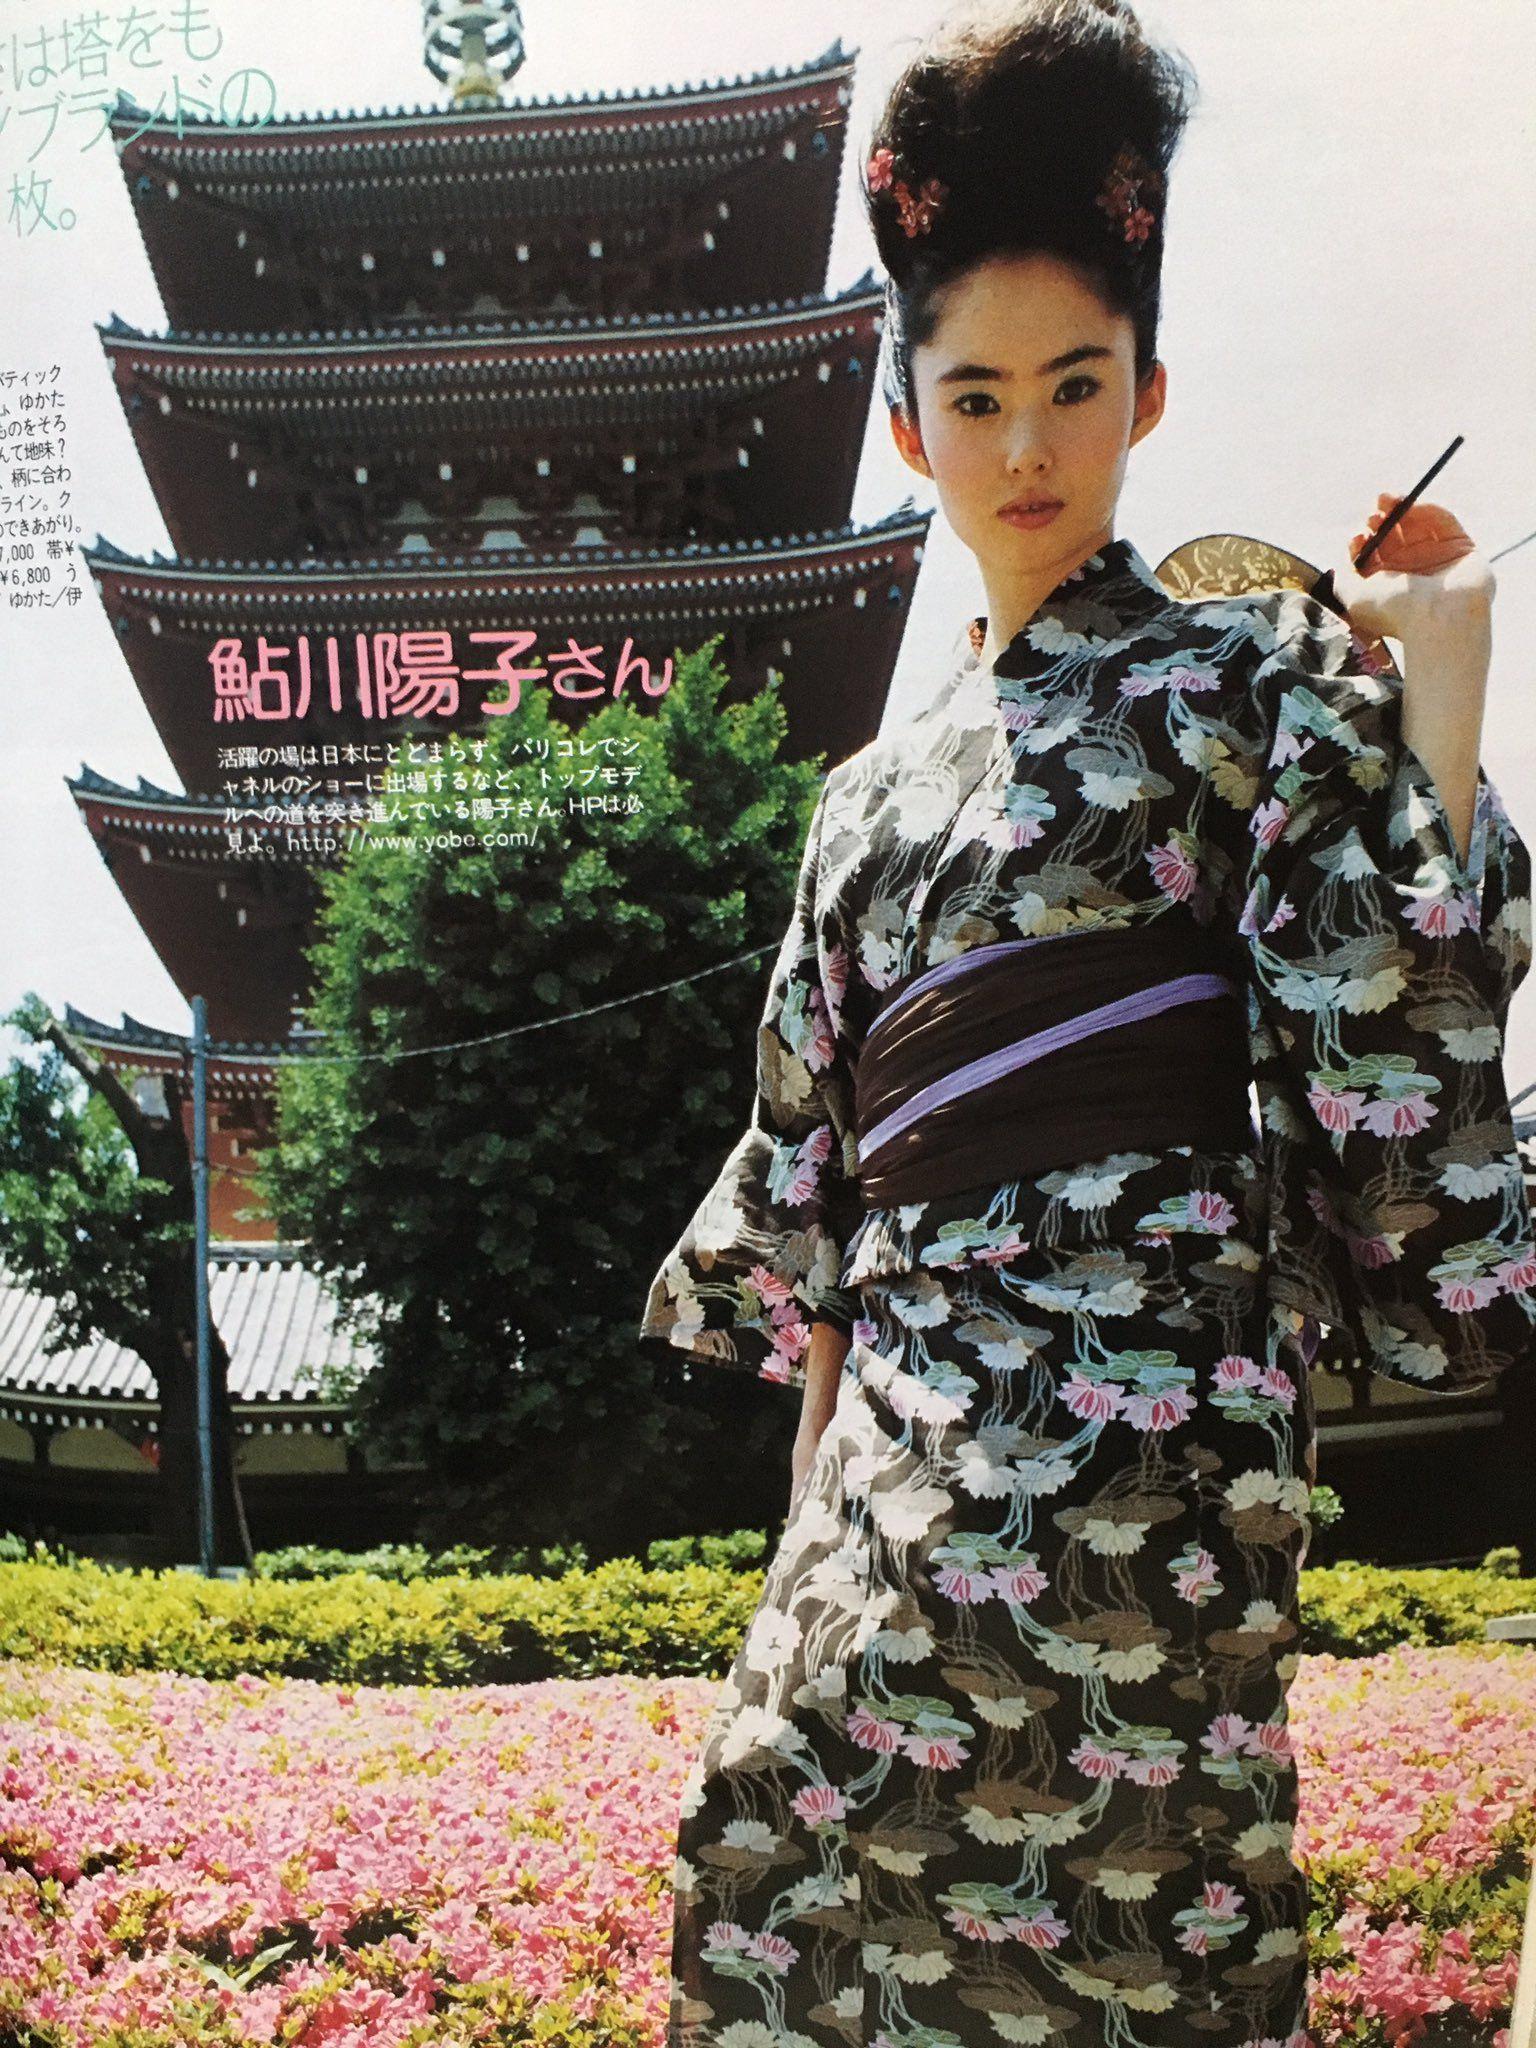 鮎川陽子の画像 p1_24